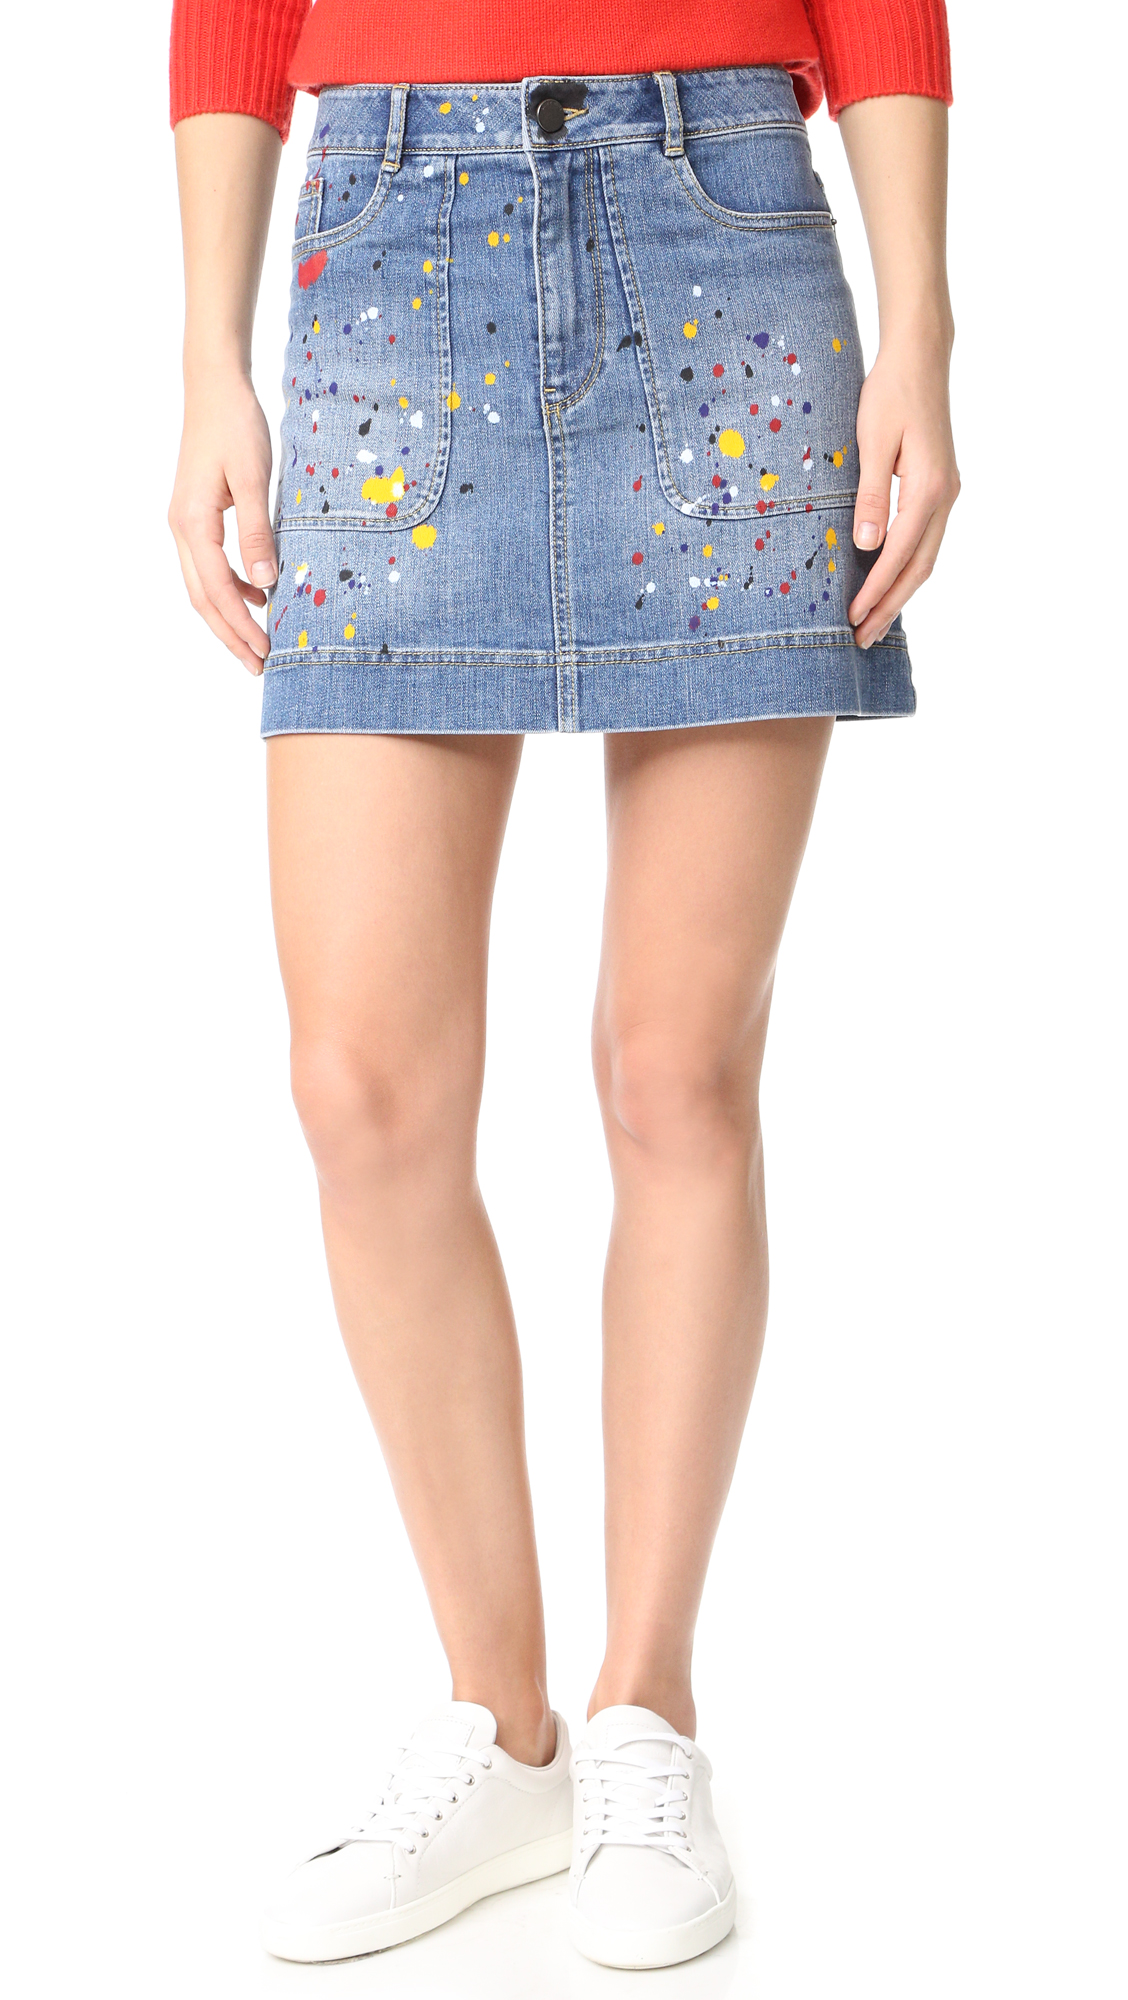 Alice + Olivia Paint Splatter Miniskirt - Denim Multi at Shopbop